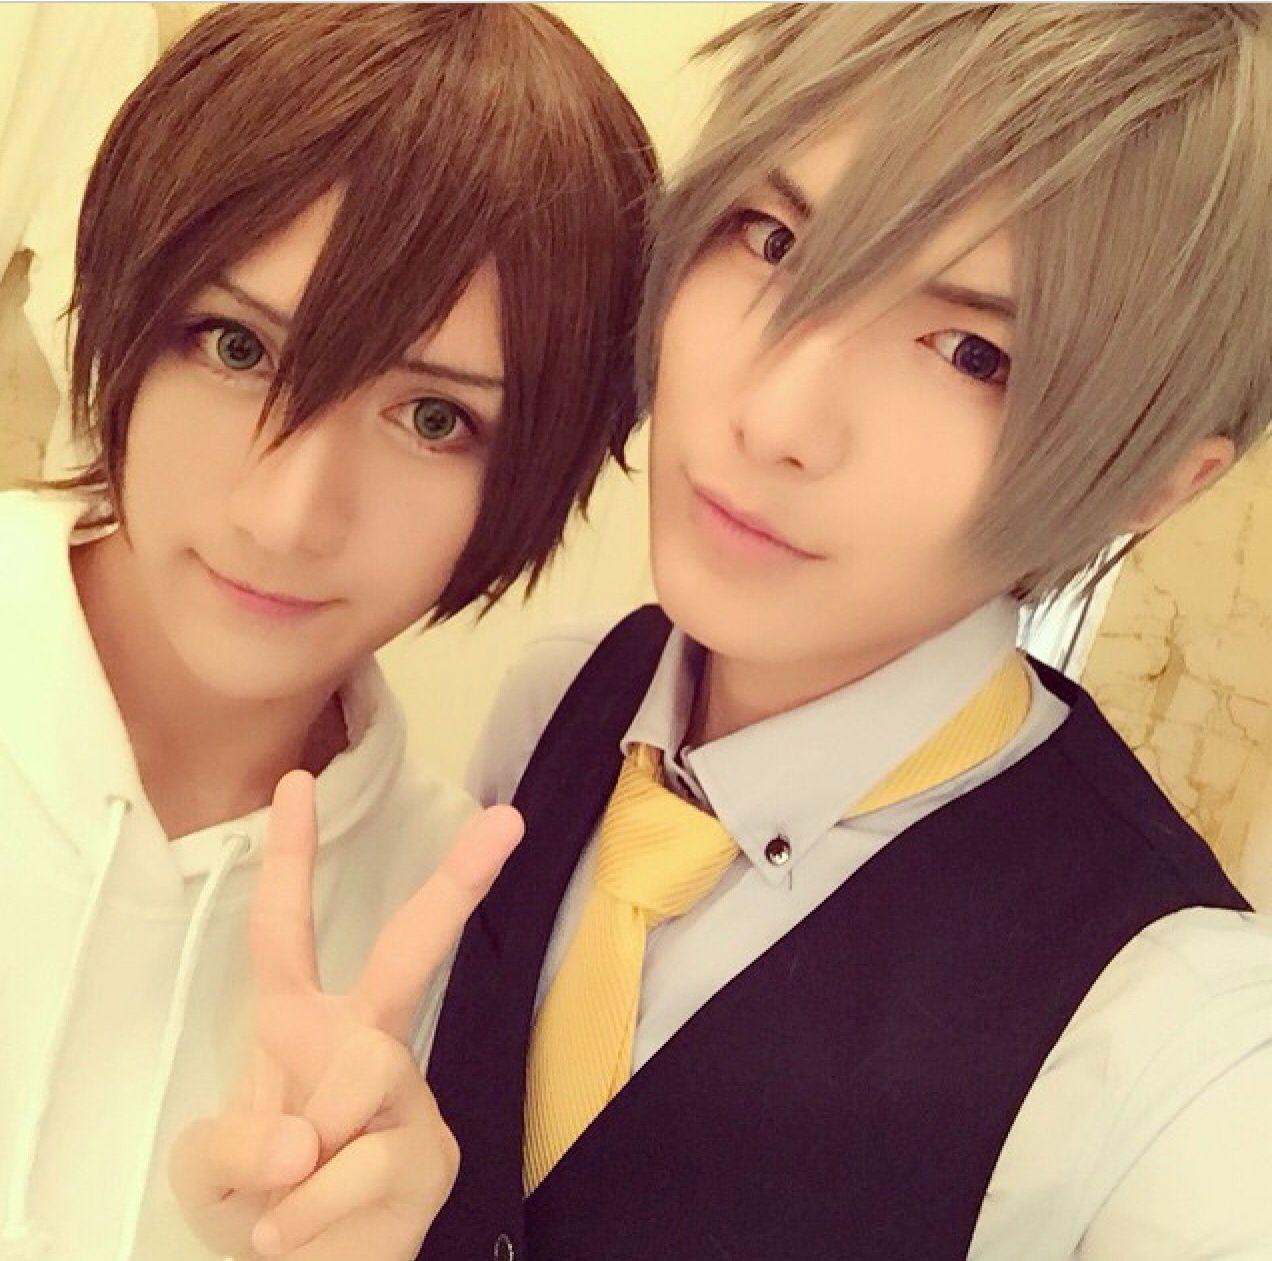 Hana and Baozi- Junjou Romantica | ♥¢σѕρℓαу♥ | Pinterest ...